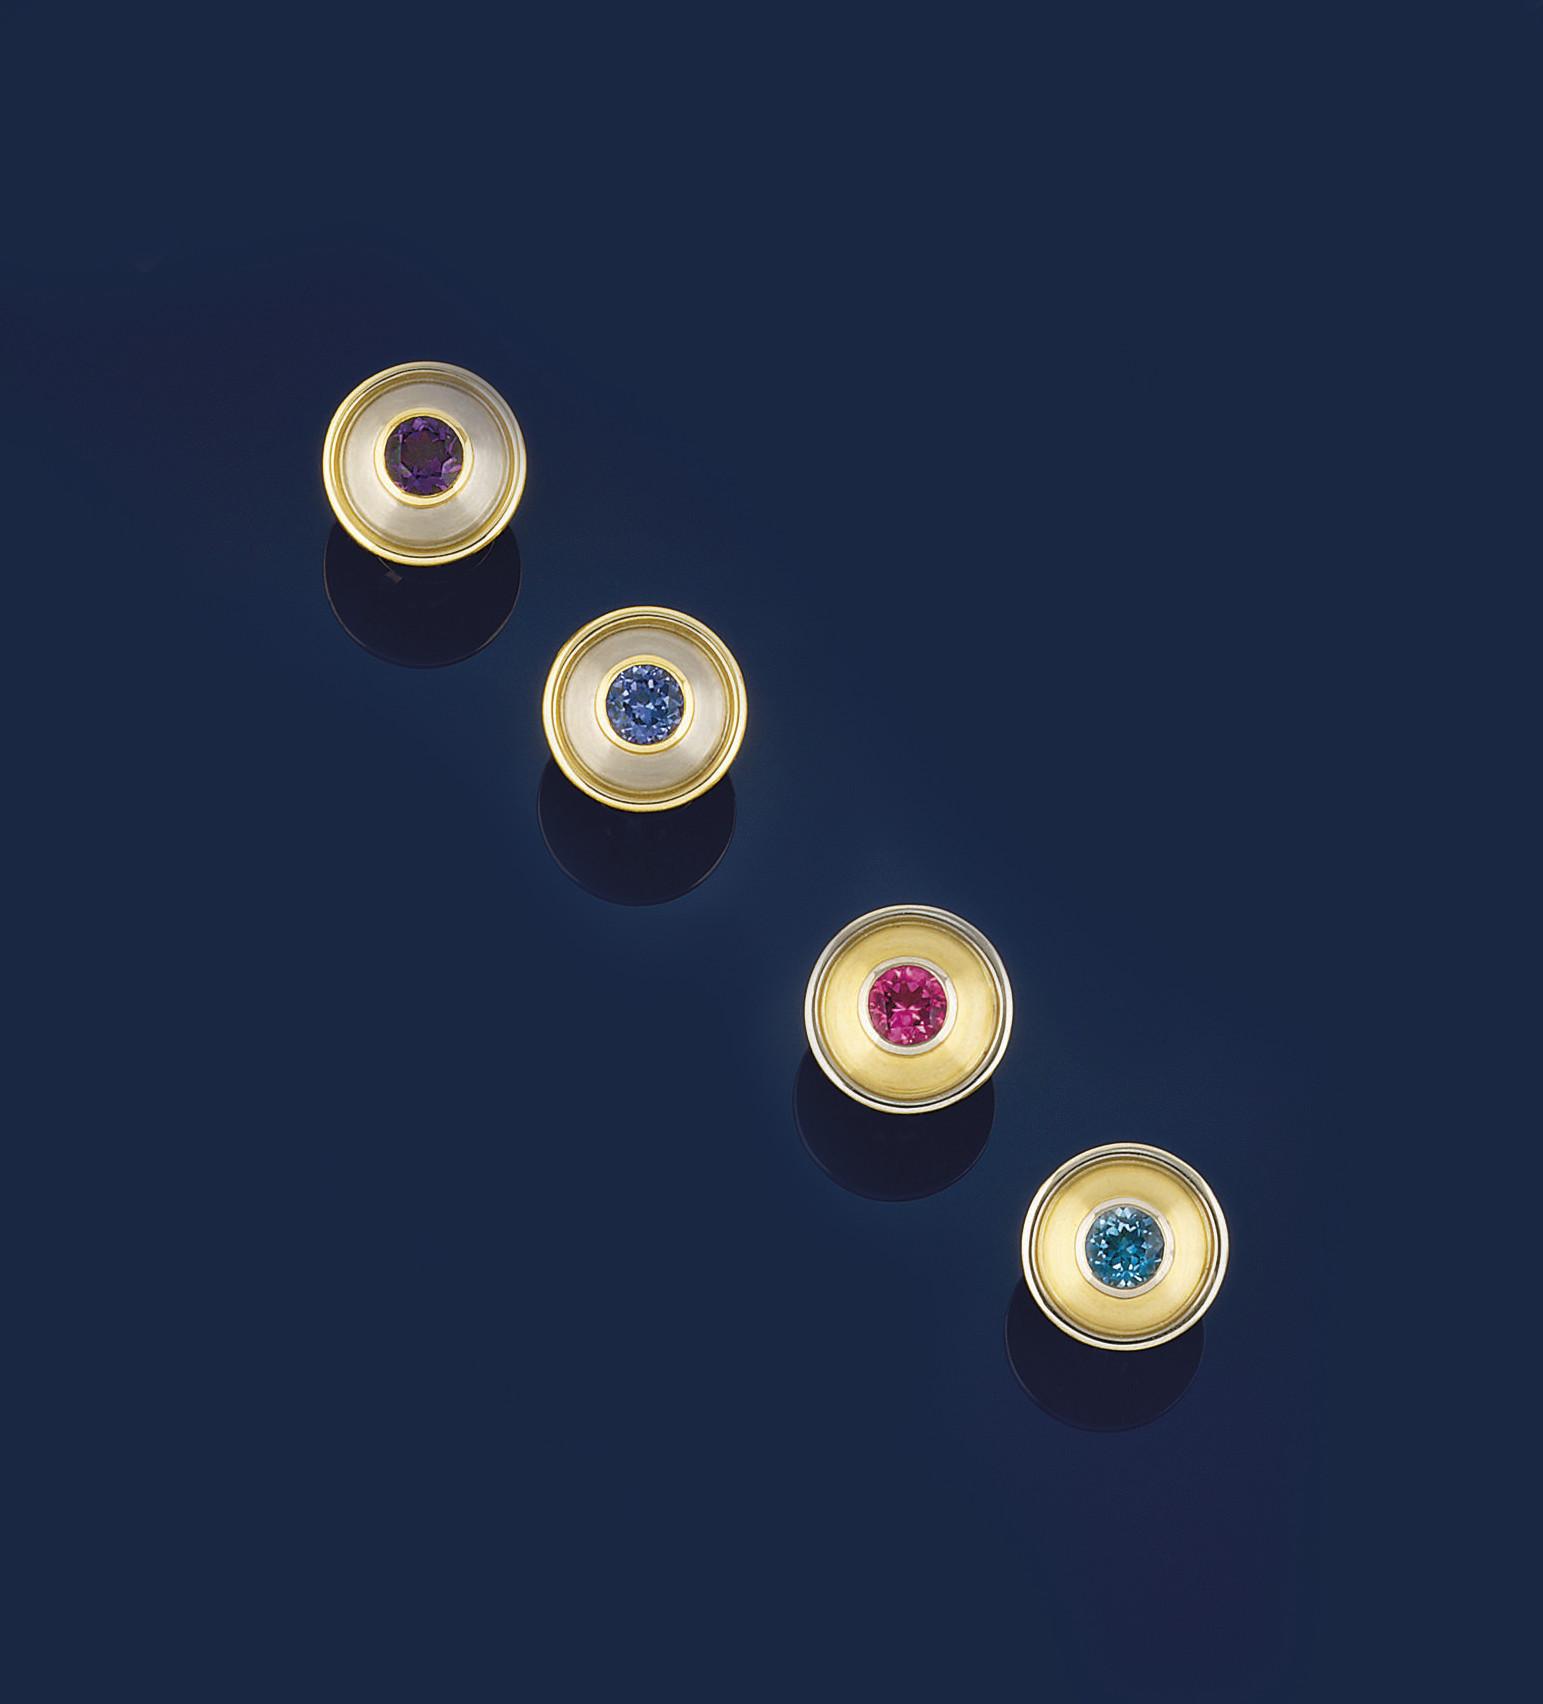 Two pairs of vari-gem cufflink